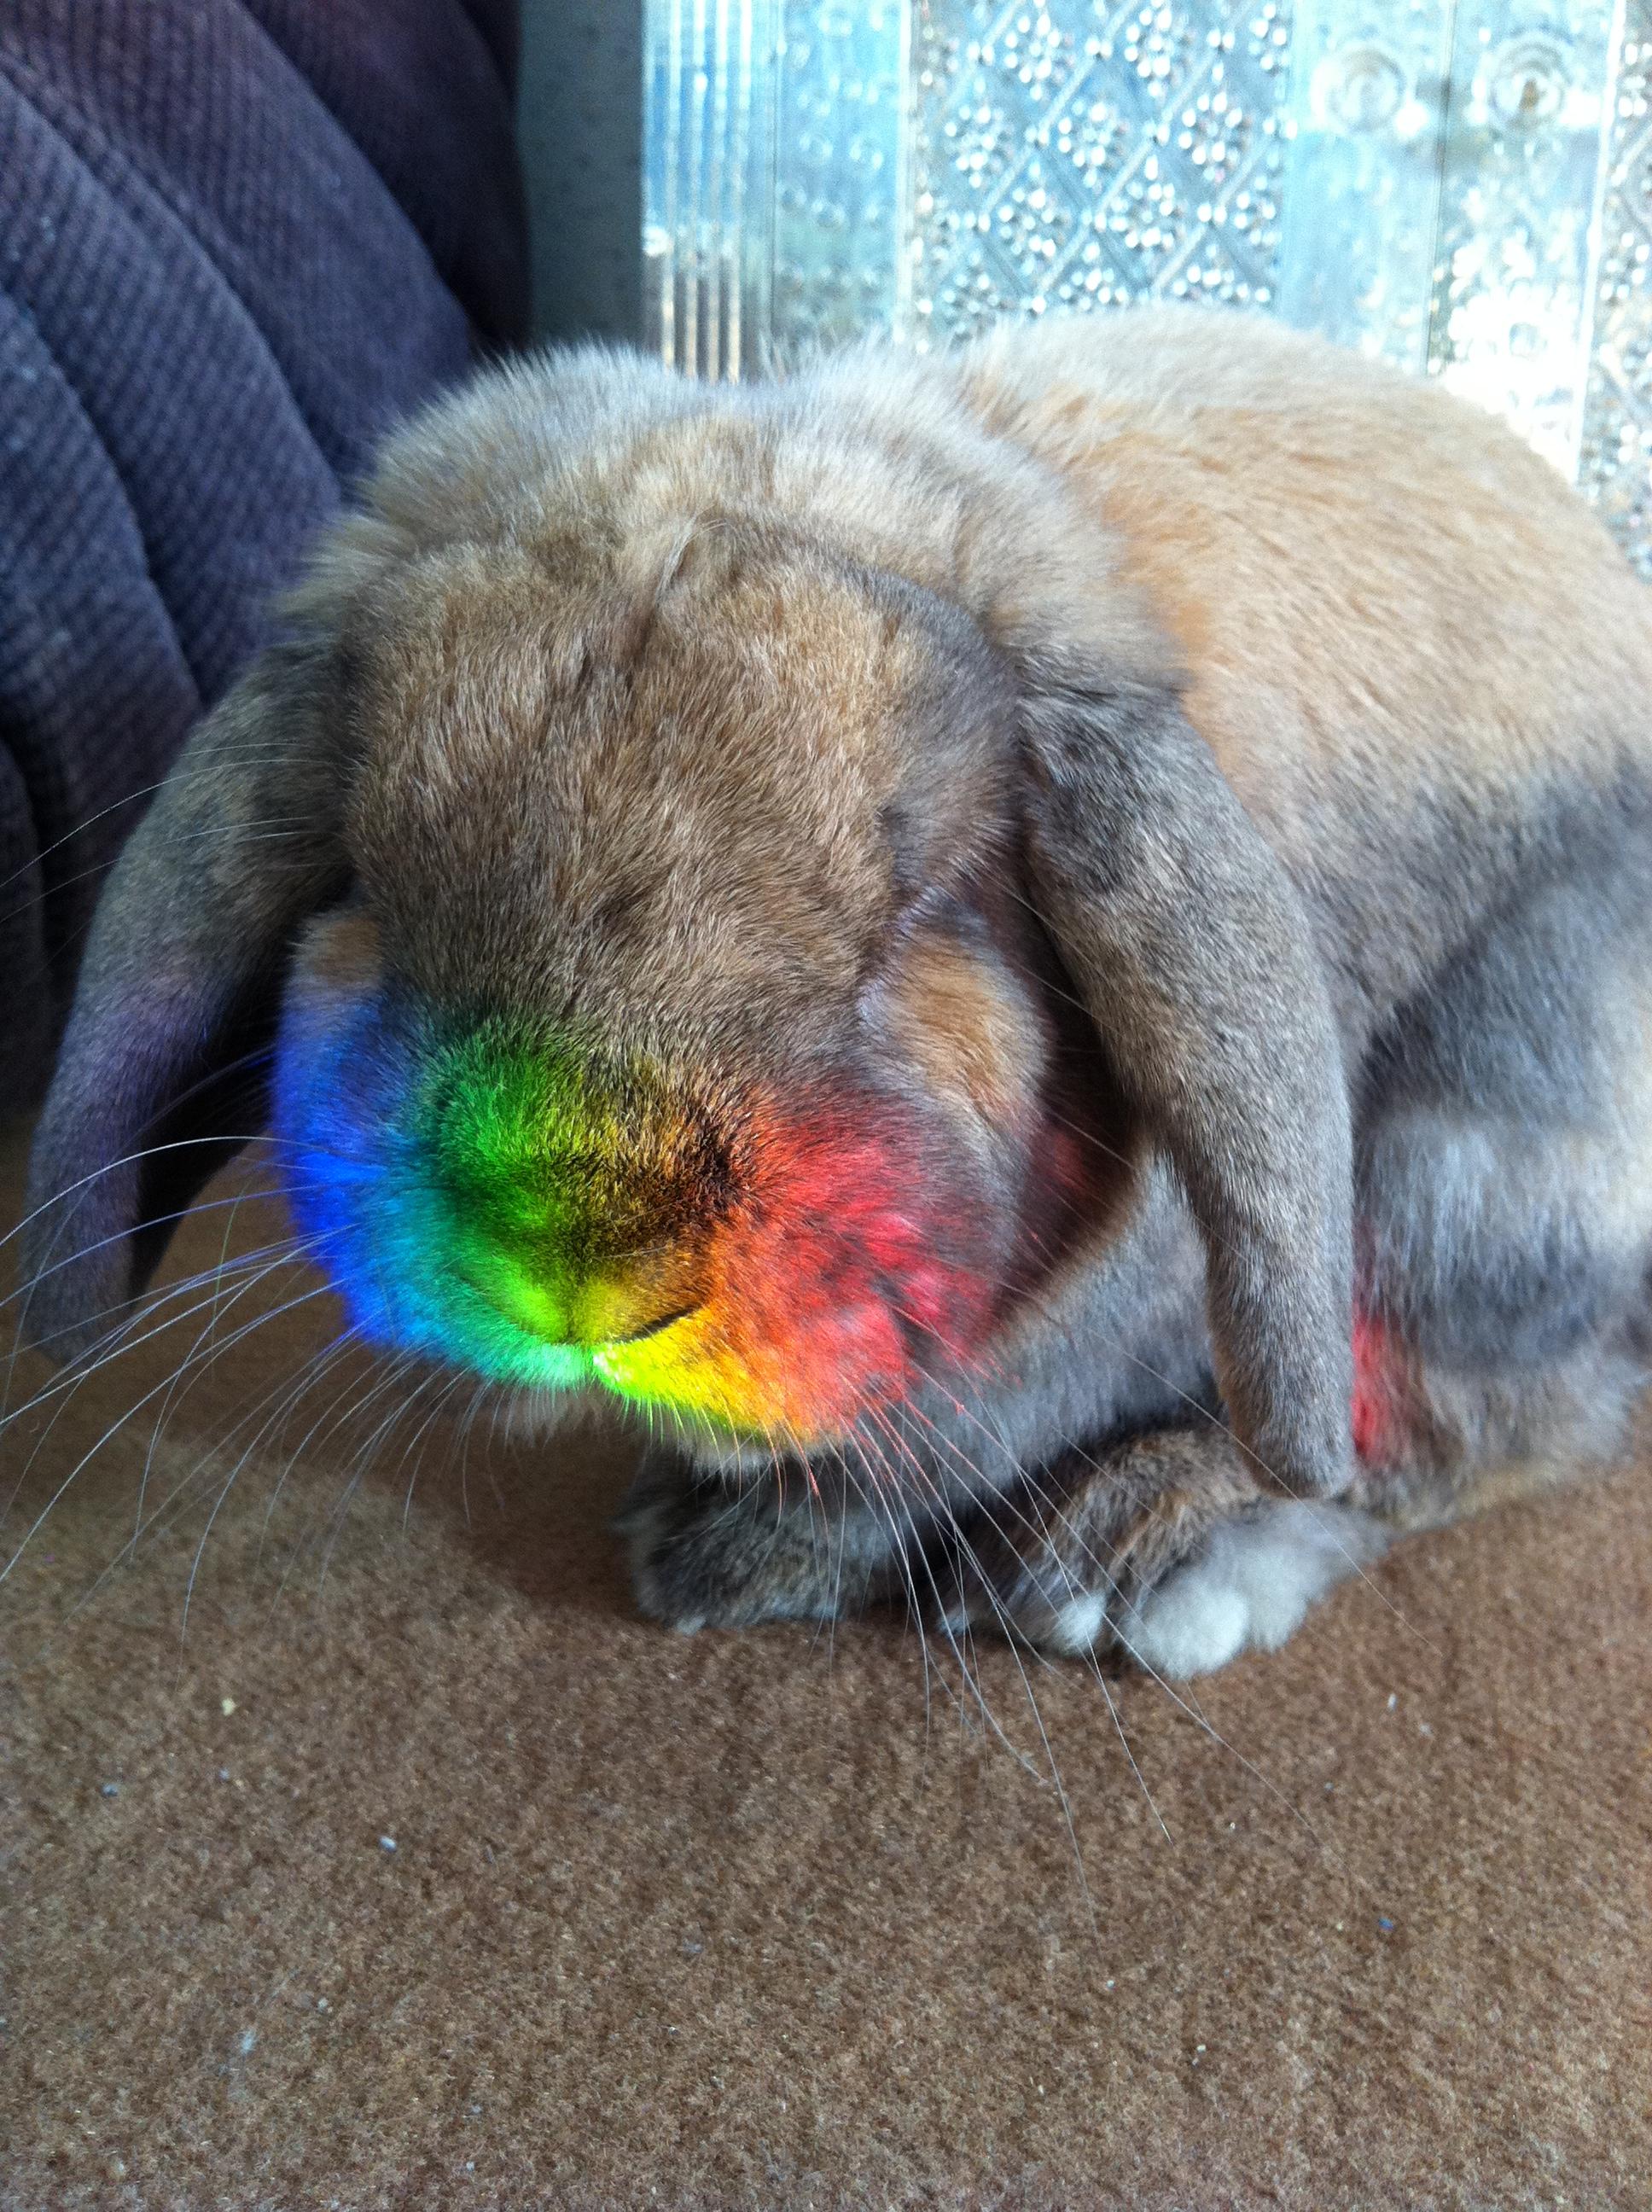 Bunny Stepped into a Rainbow